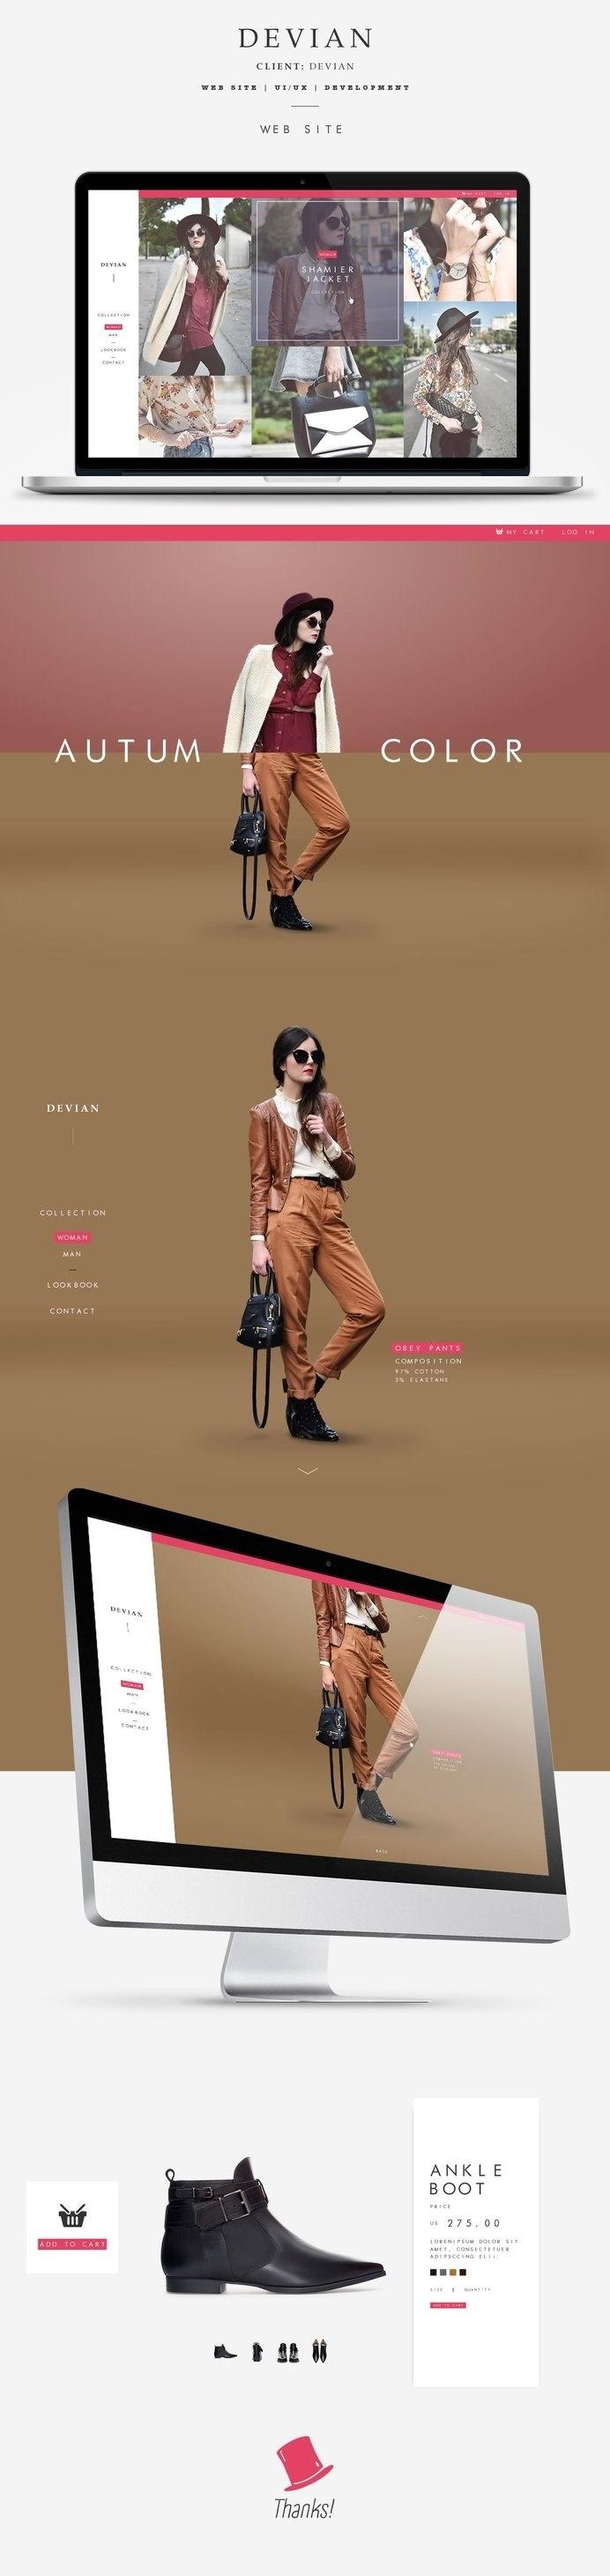 devian – web design inspiration #inspiration #ux #design #ui #web